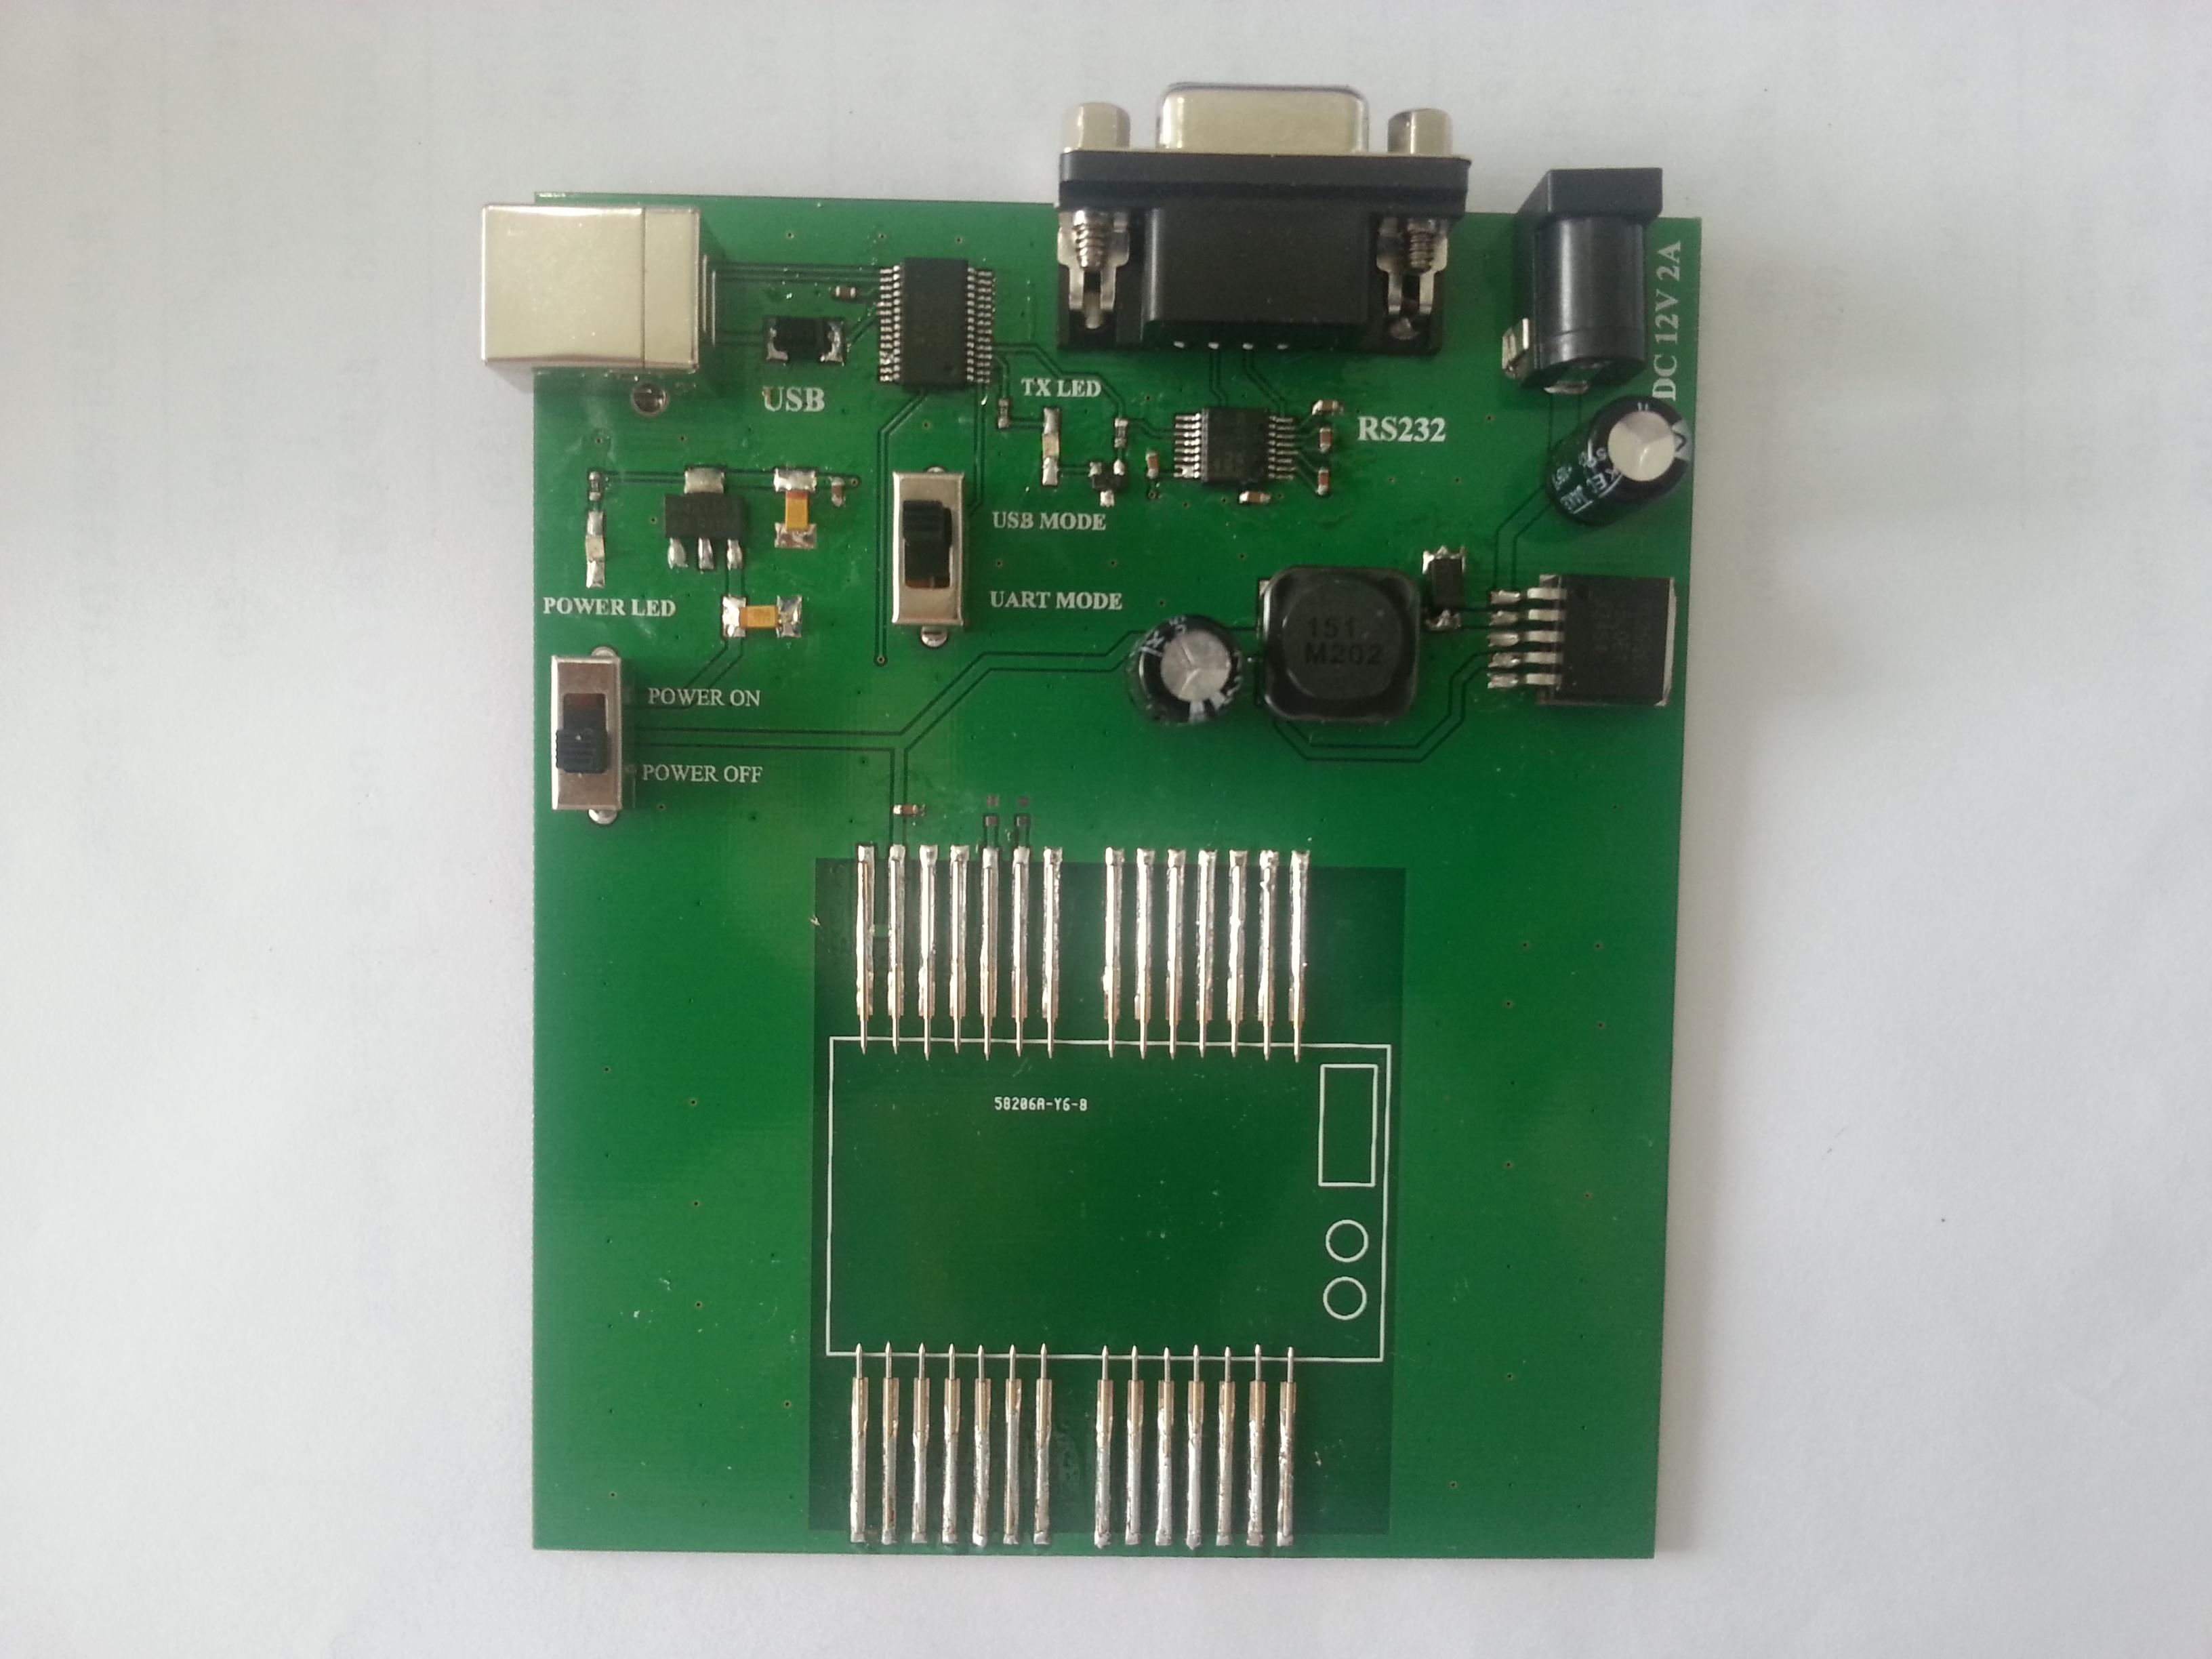 M6e-mircoRFID读写器评估演示板